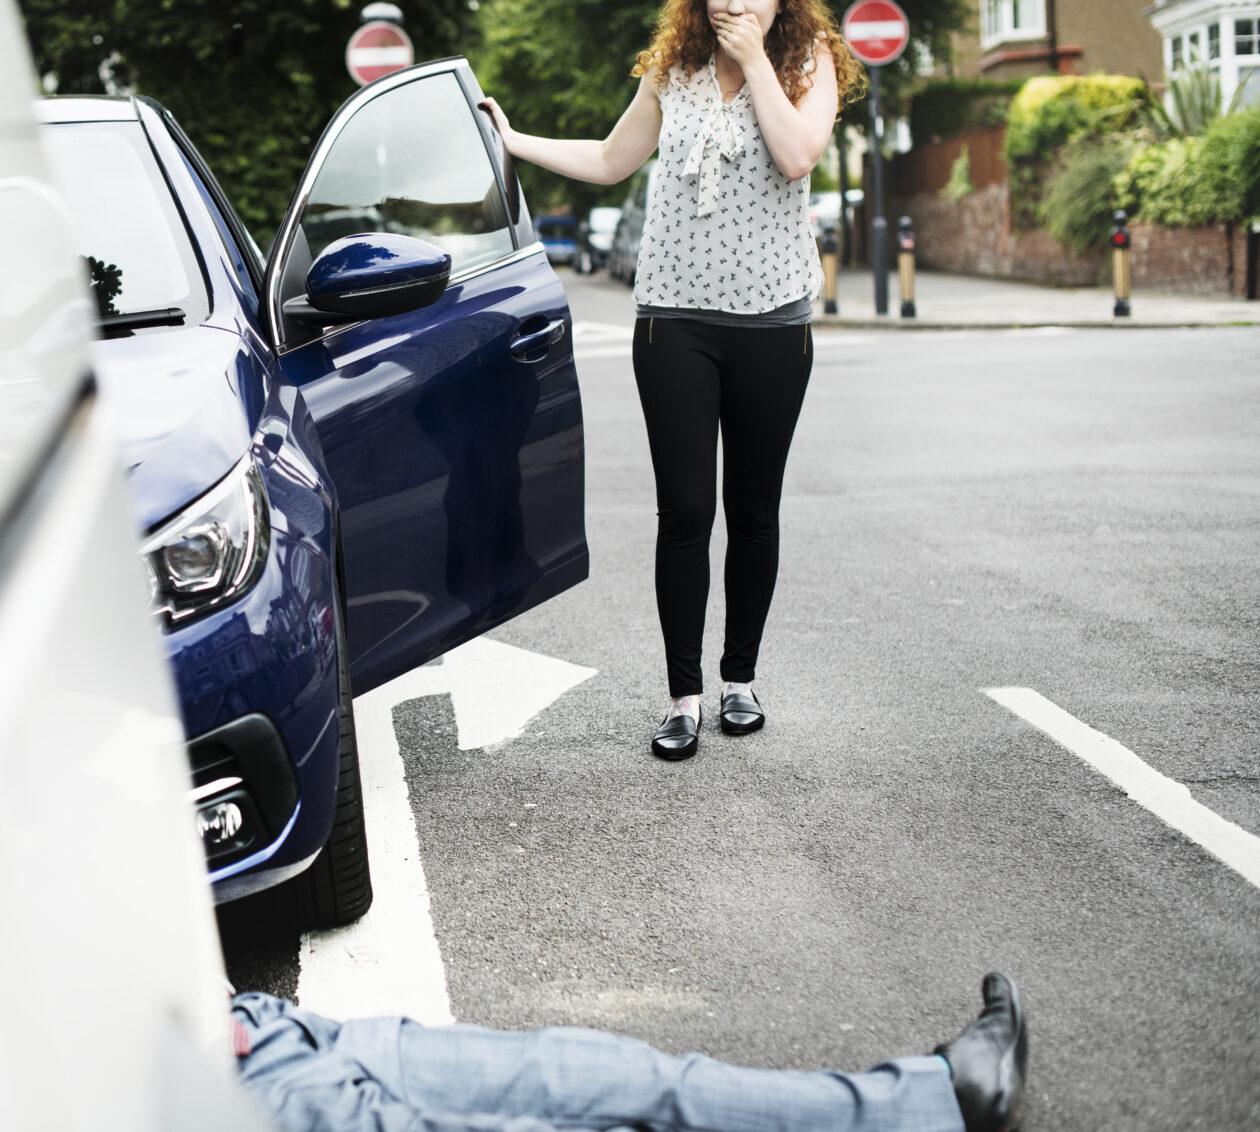 lesioni stradali gravi